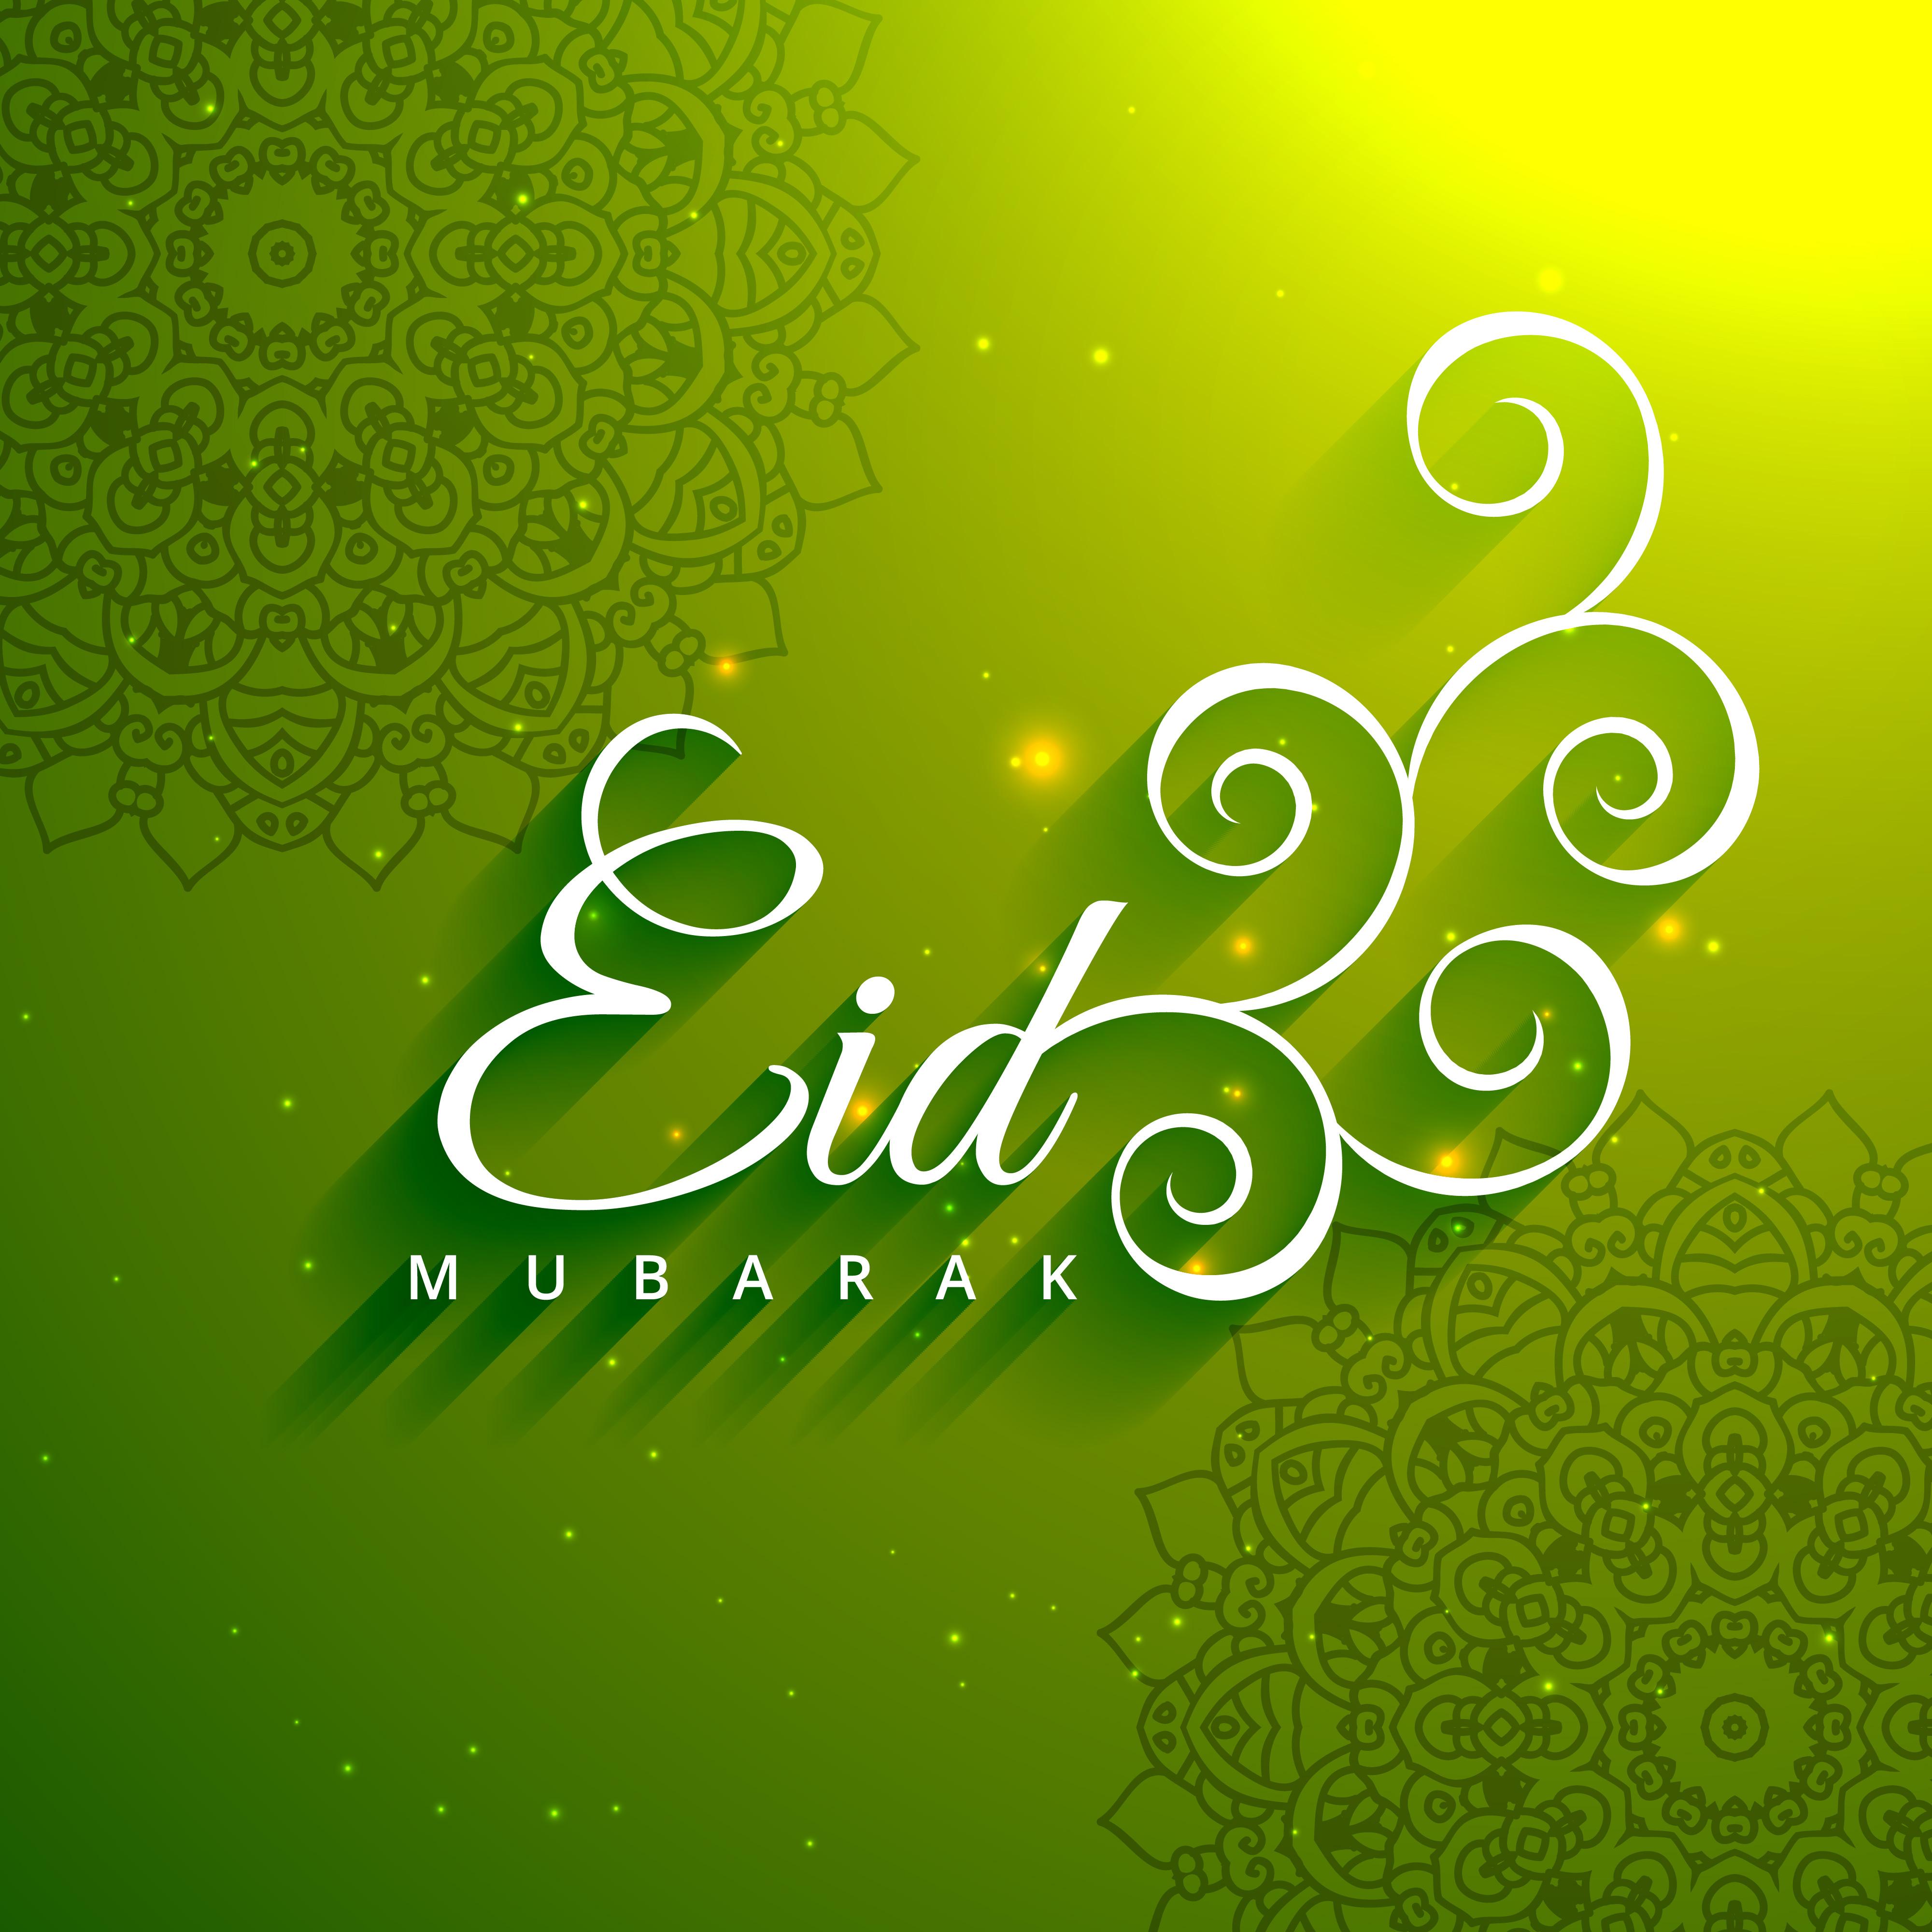 eid mubarak creative text in green background  download